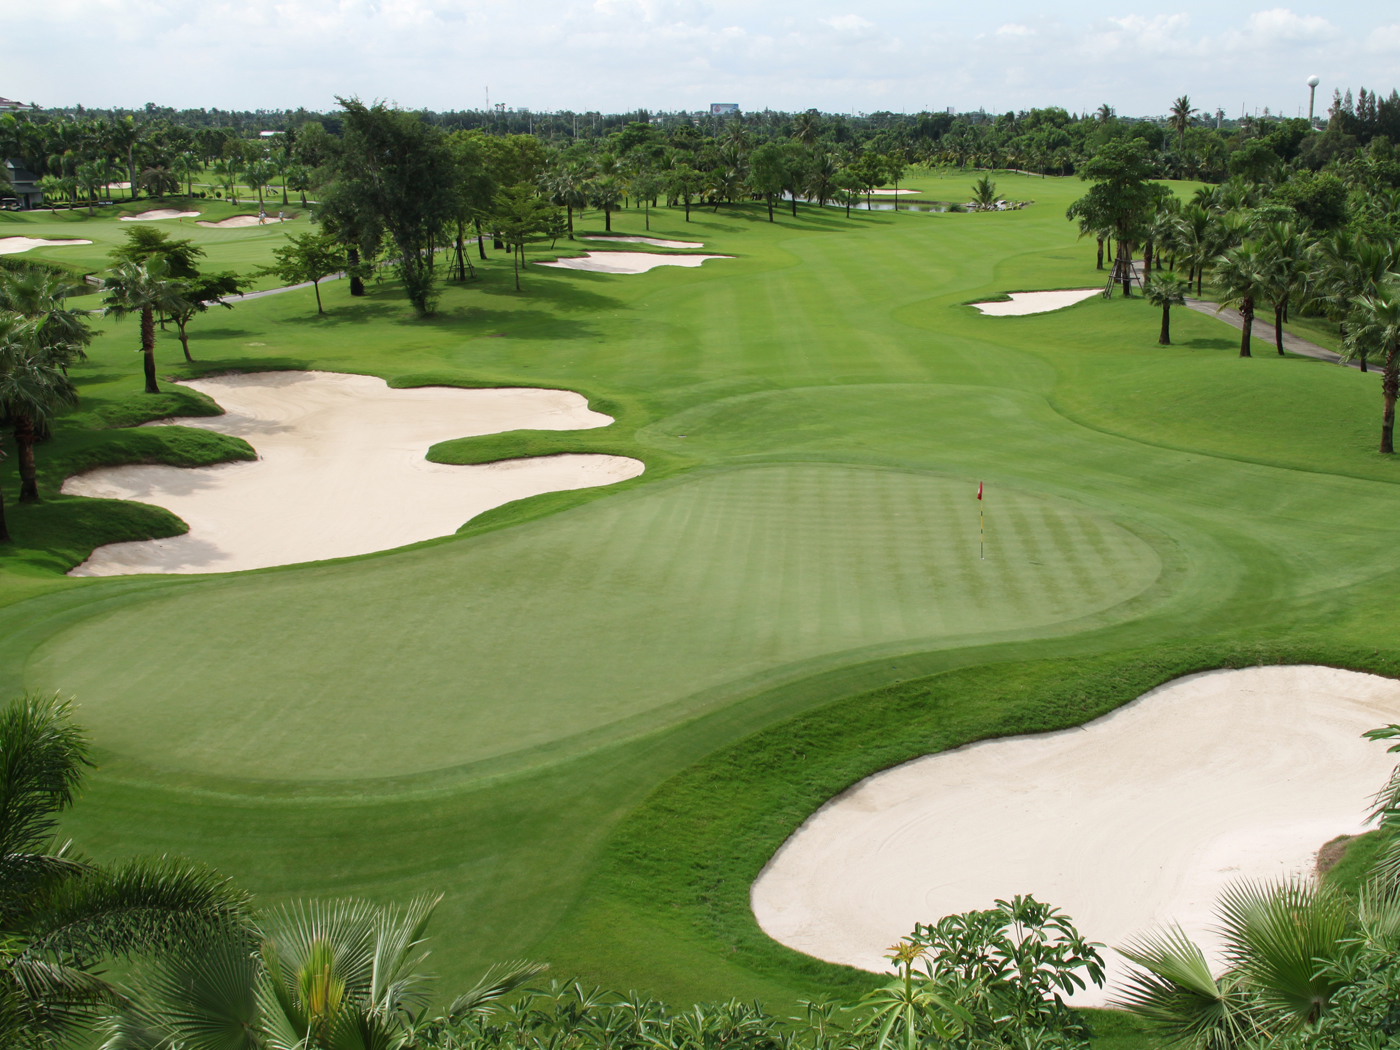 Thailand Laem Chabang International Country Club